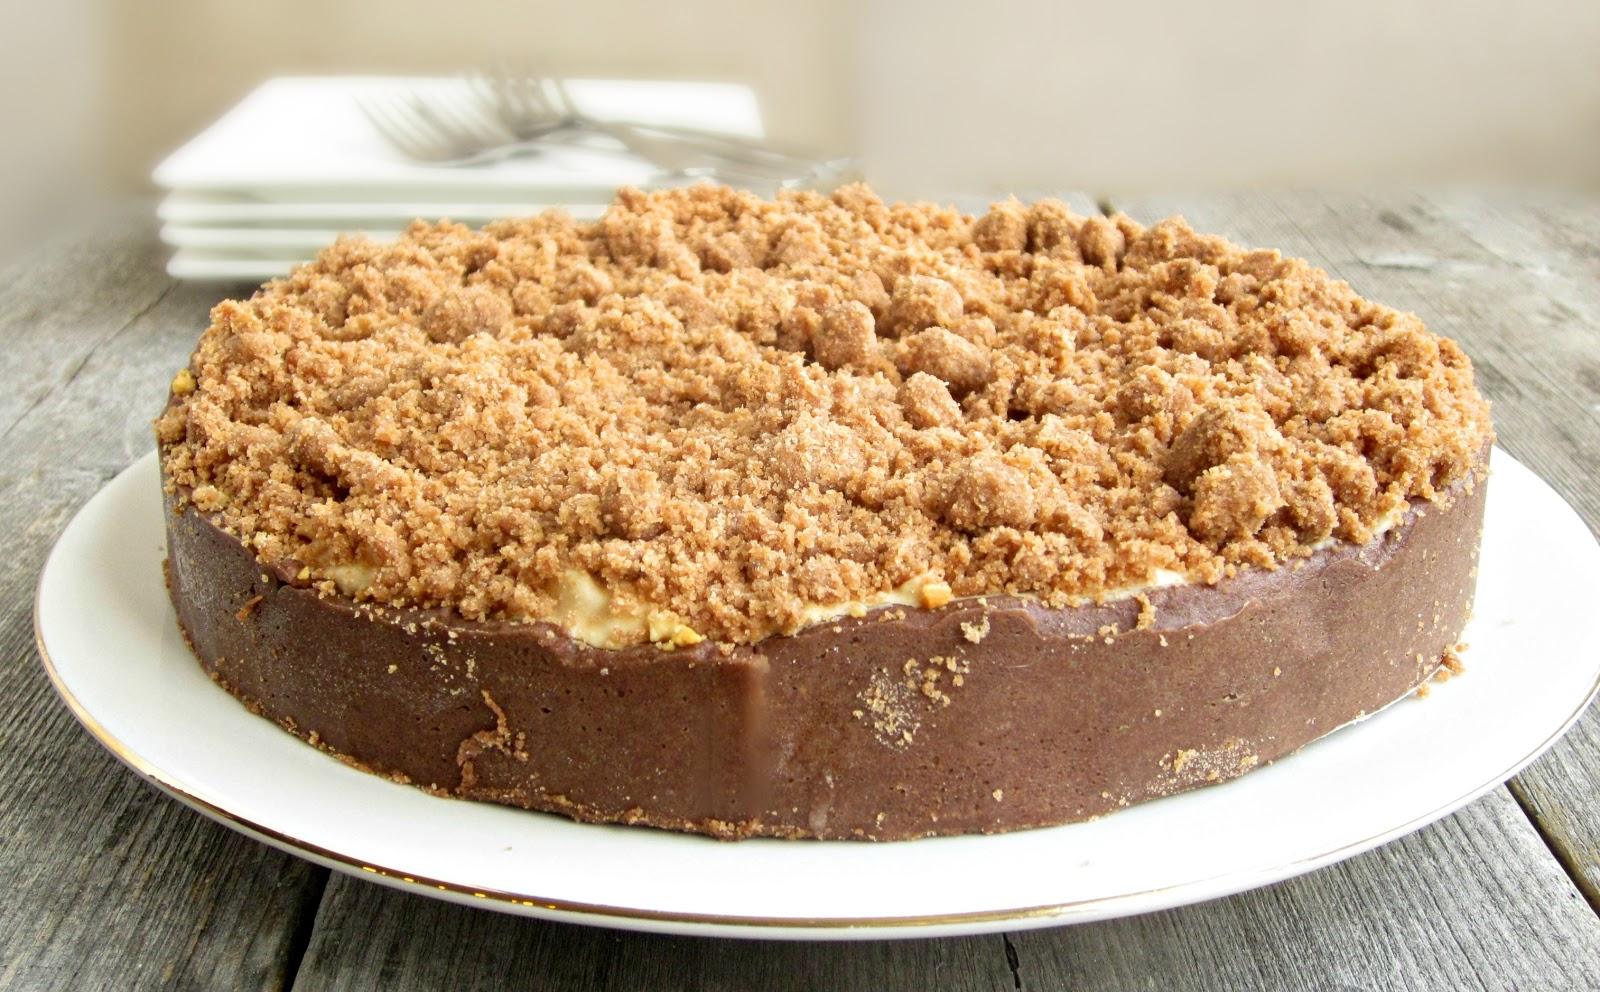 Chocolate+Peanut+Butter+Crunch+Cake+1.JPG